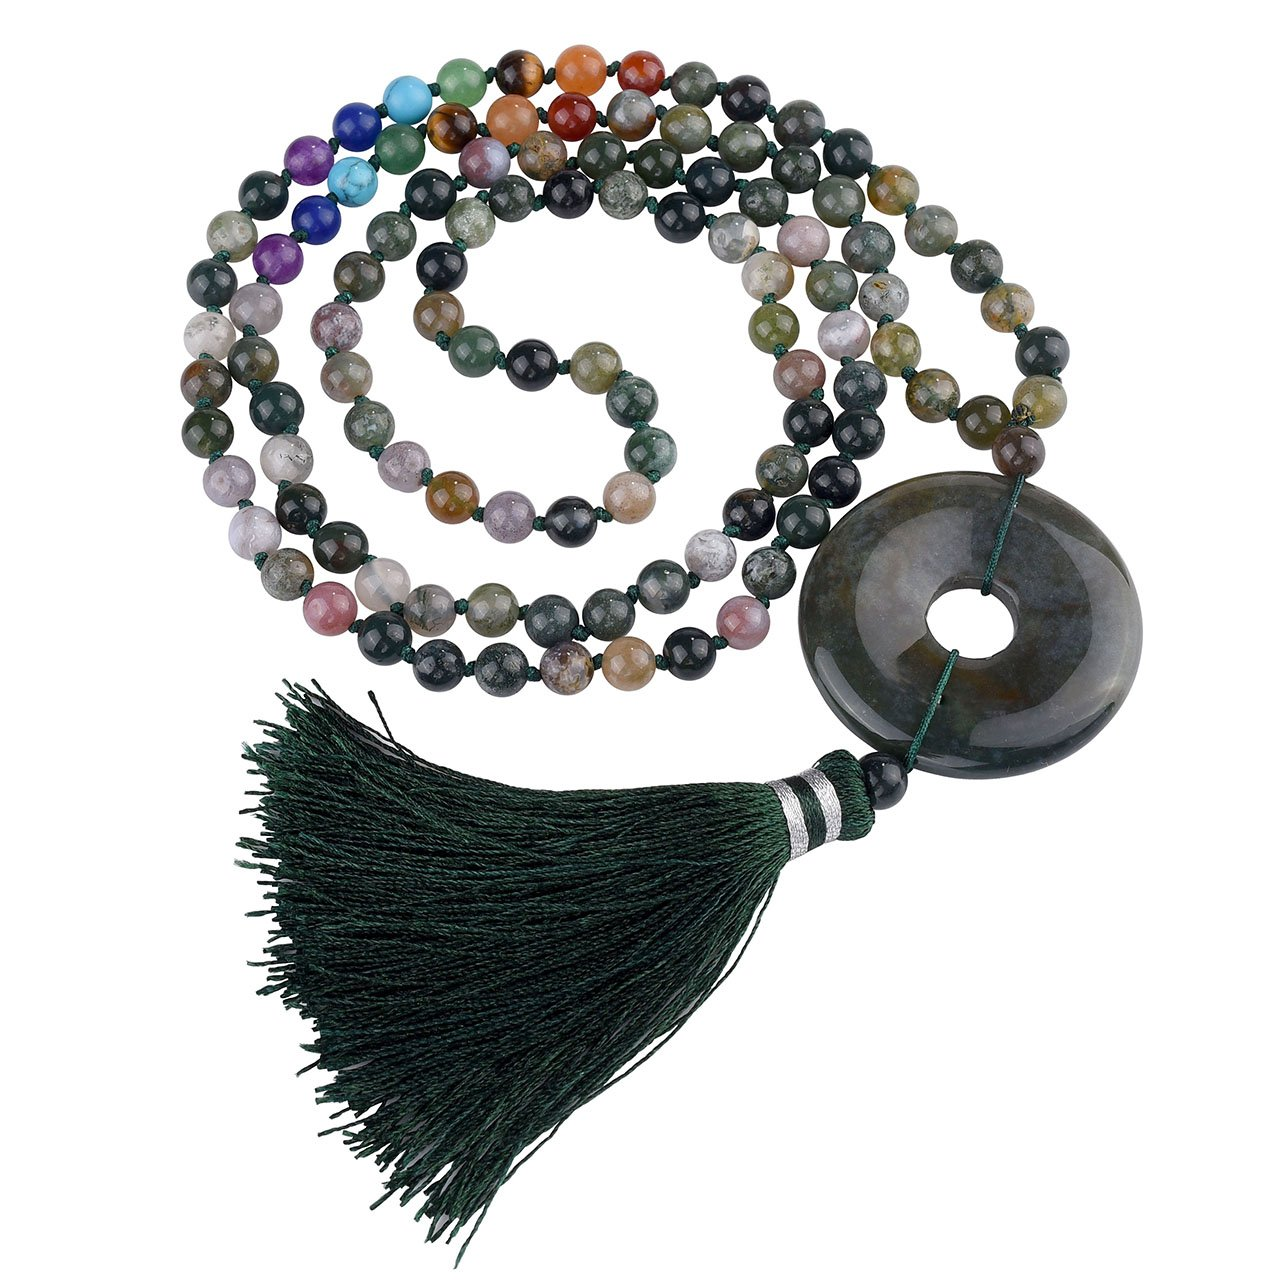 JOVIVI 6mm Moss Agate Gemstones 108 Buddhist Prayer Beads 7 Chakra Multilayer Mala Beads Donut Tassel Bracelet Necklace by Jovivi